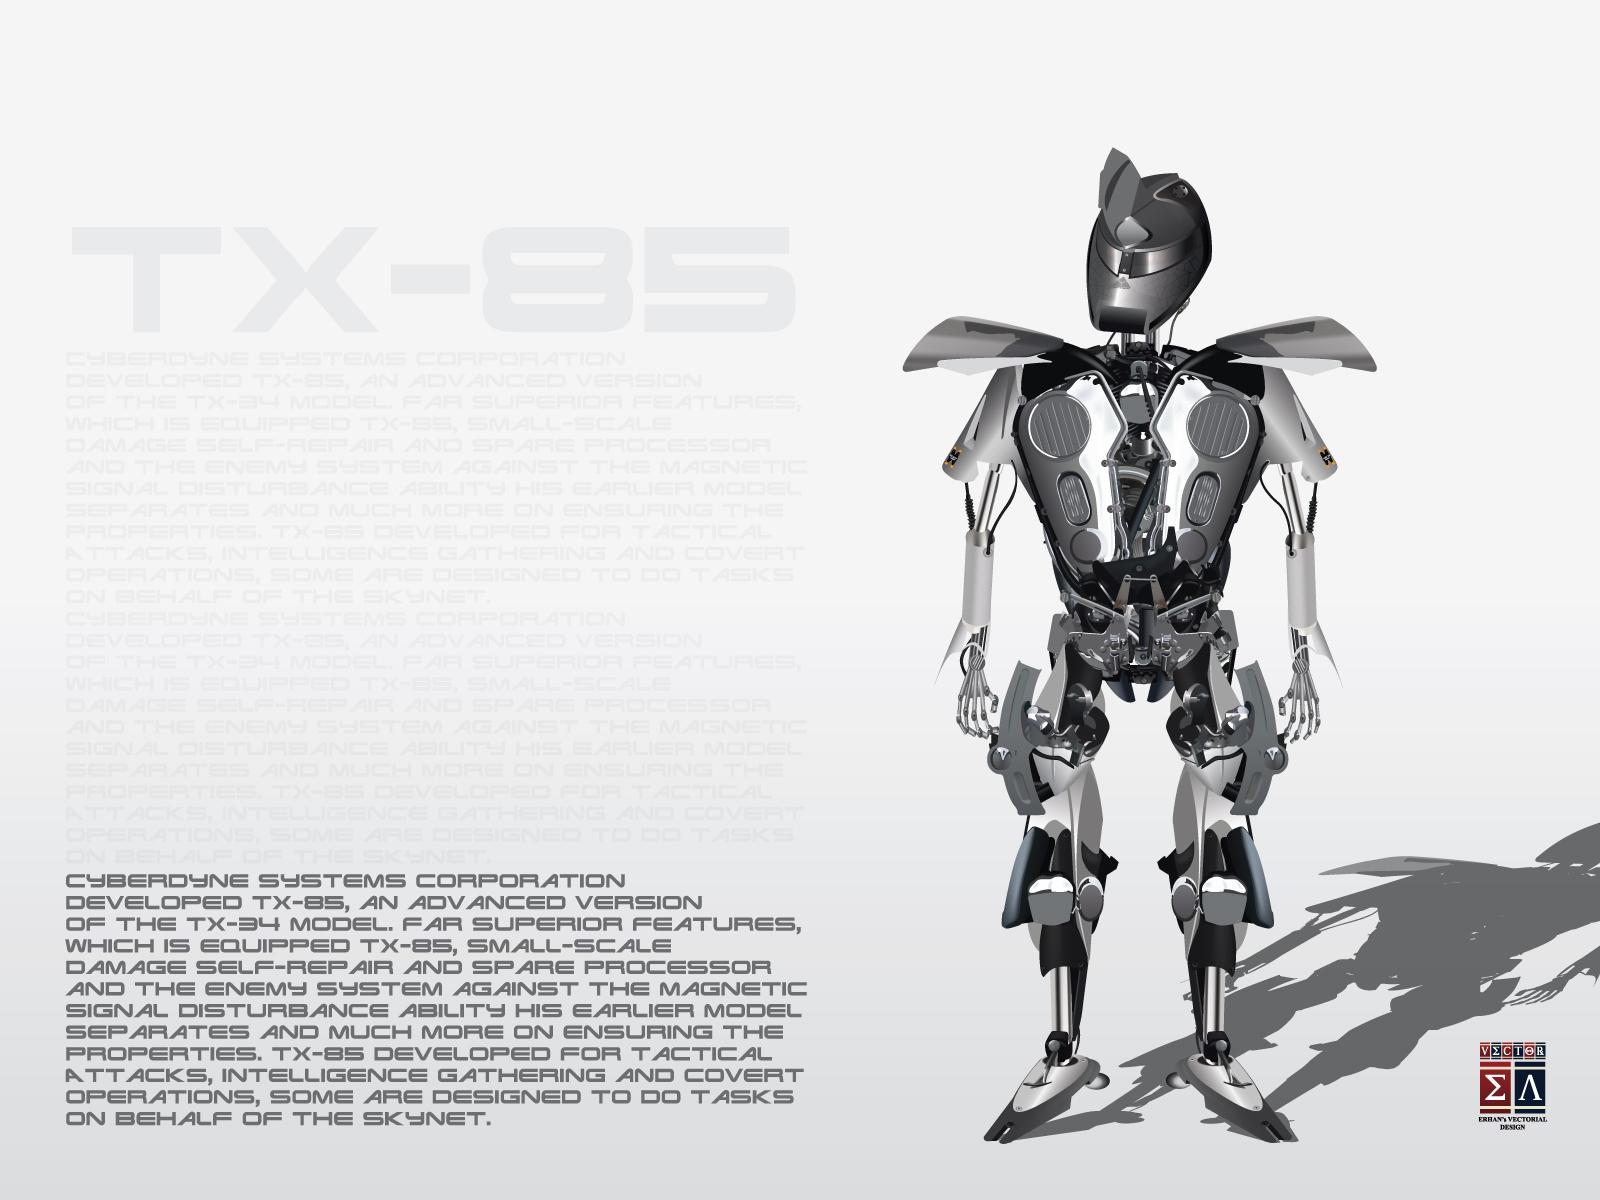 TX-85 Cybernetic Organism - Illustrasyon